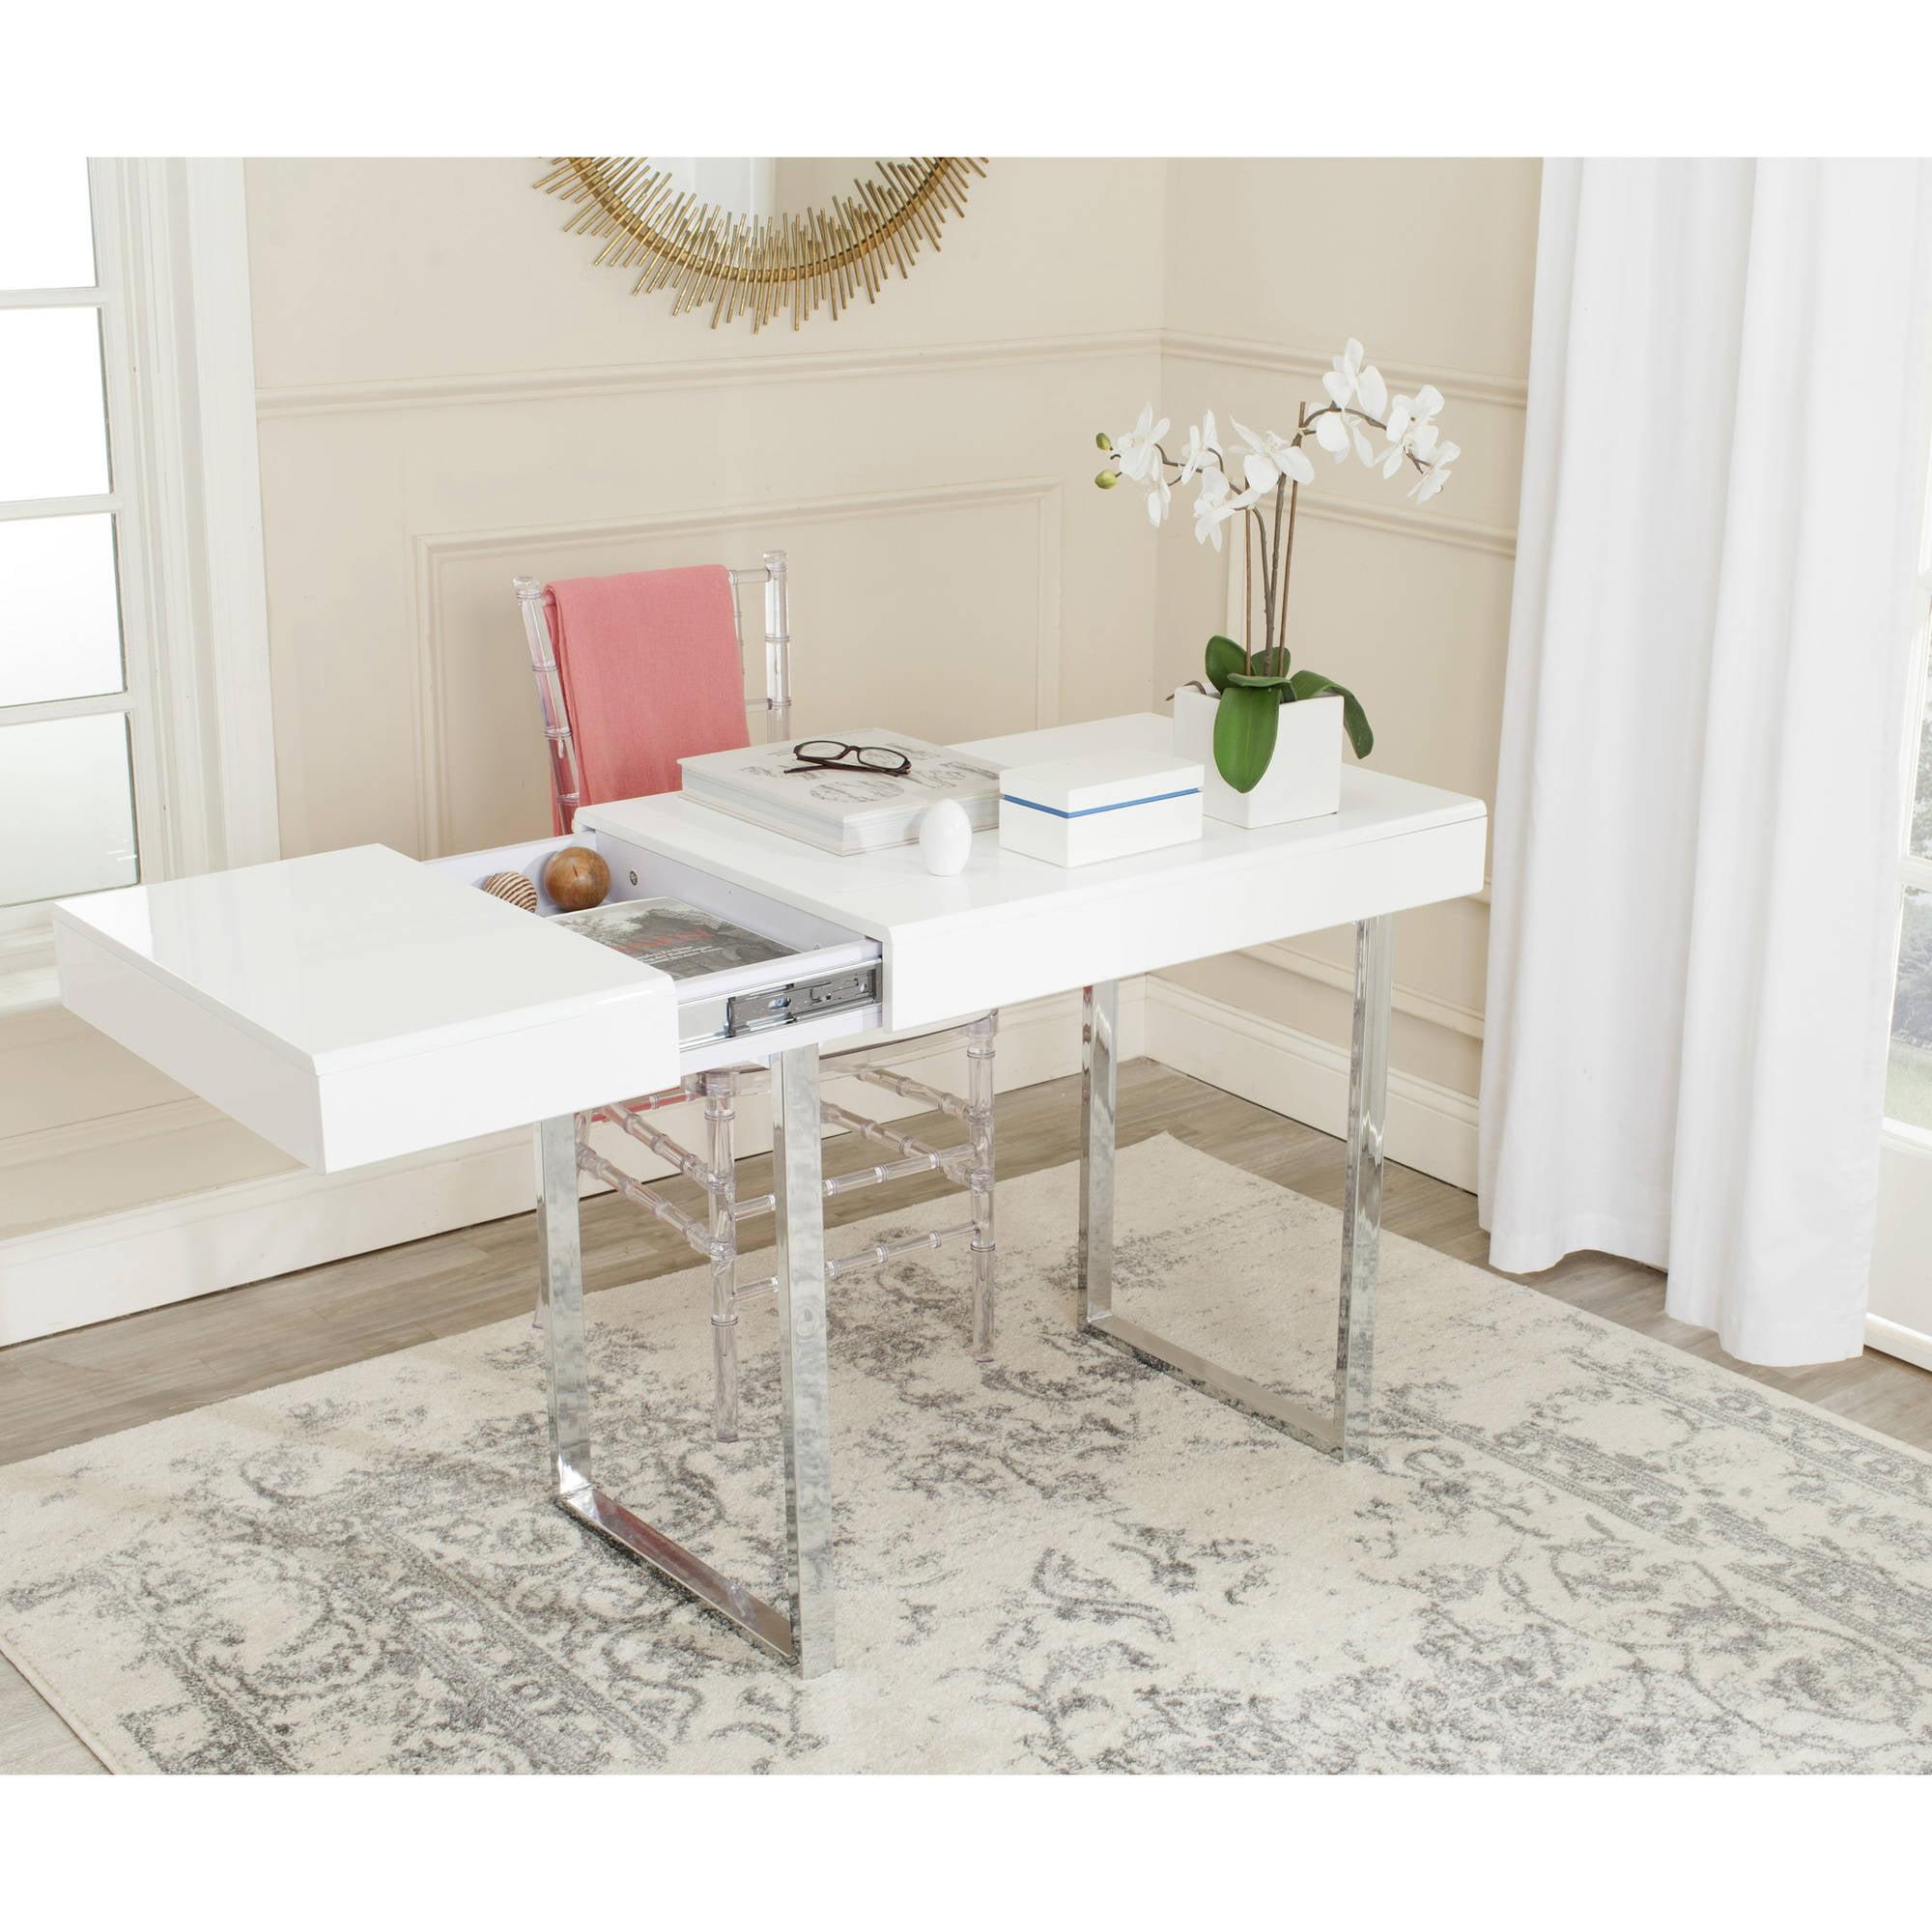 Safavieh Berkley Desk, White and Chrome